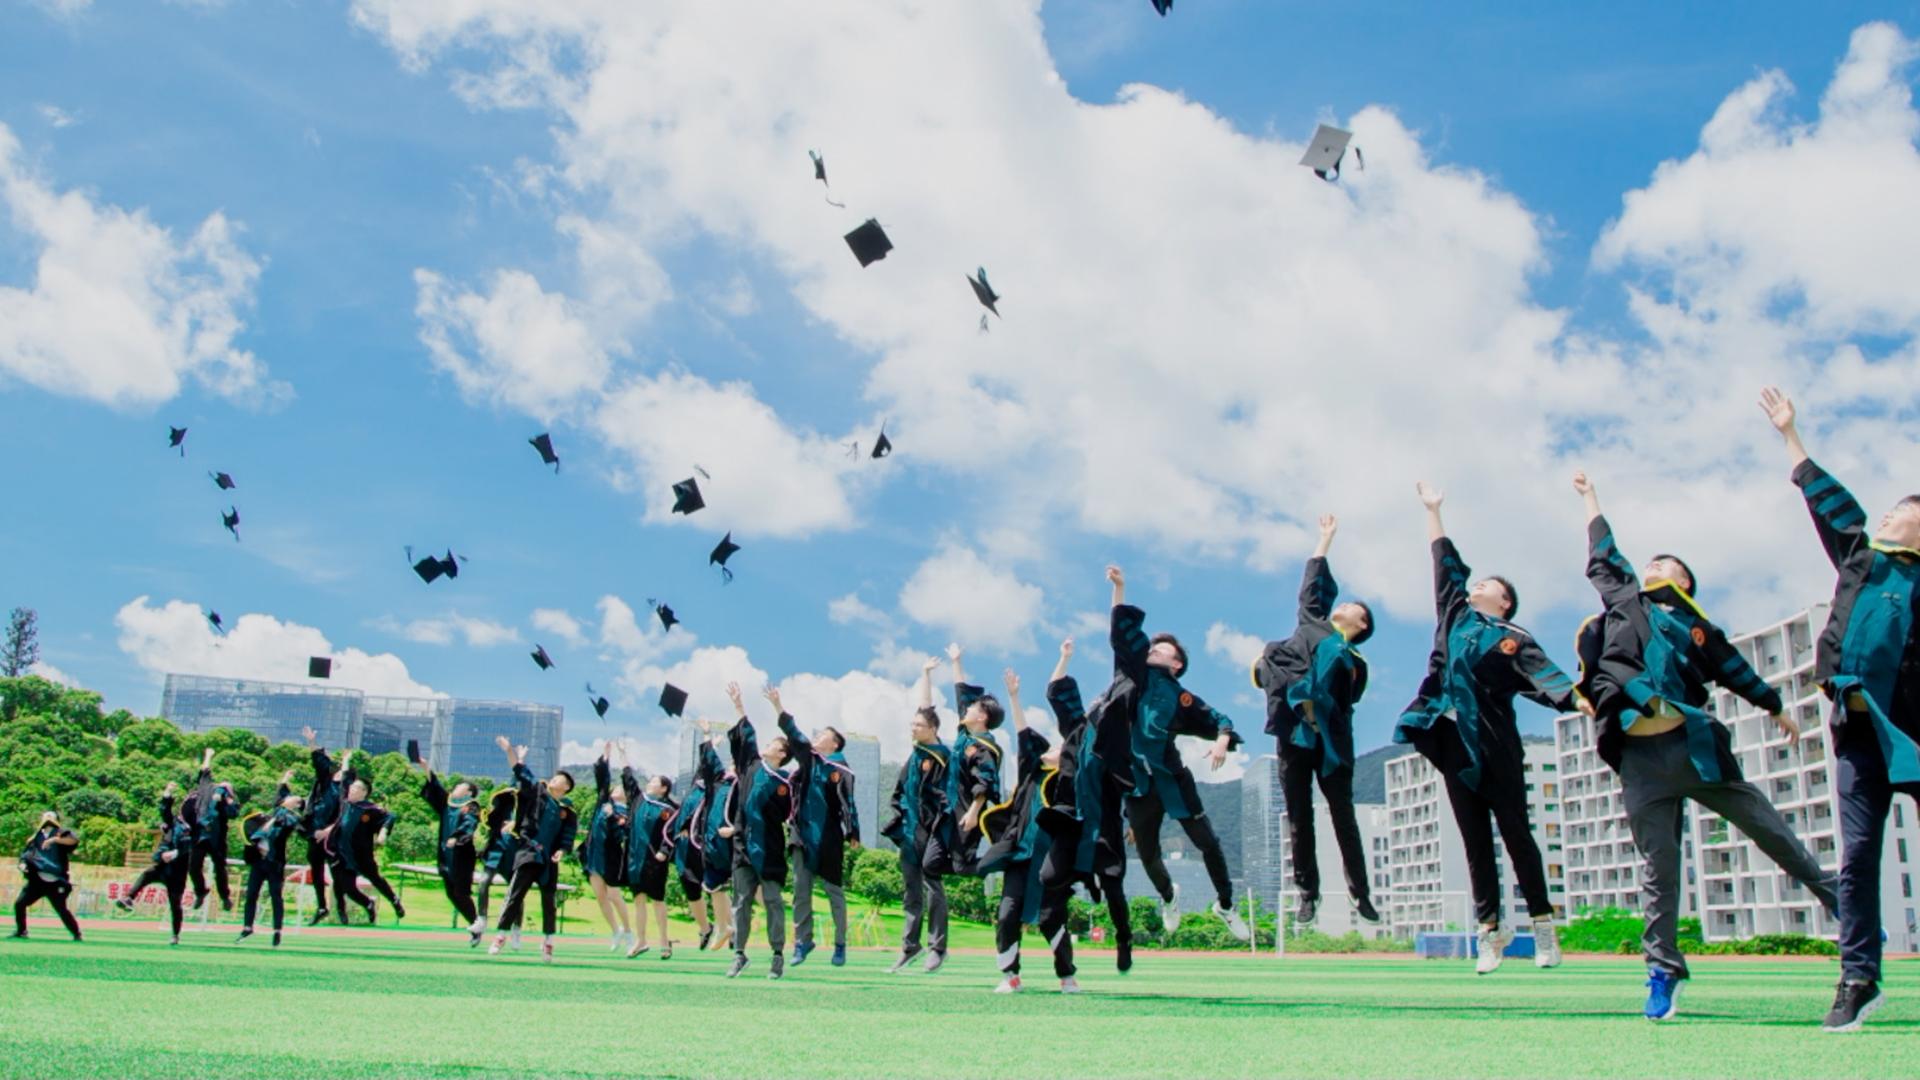 Data on 2020 graduates released